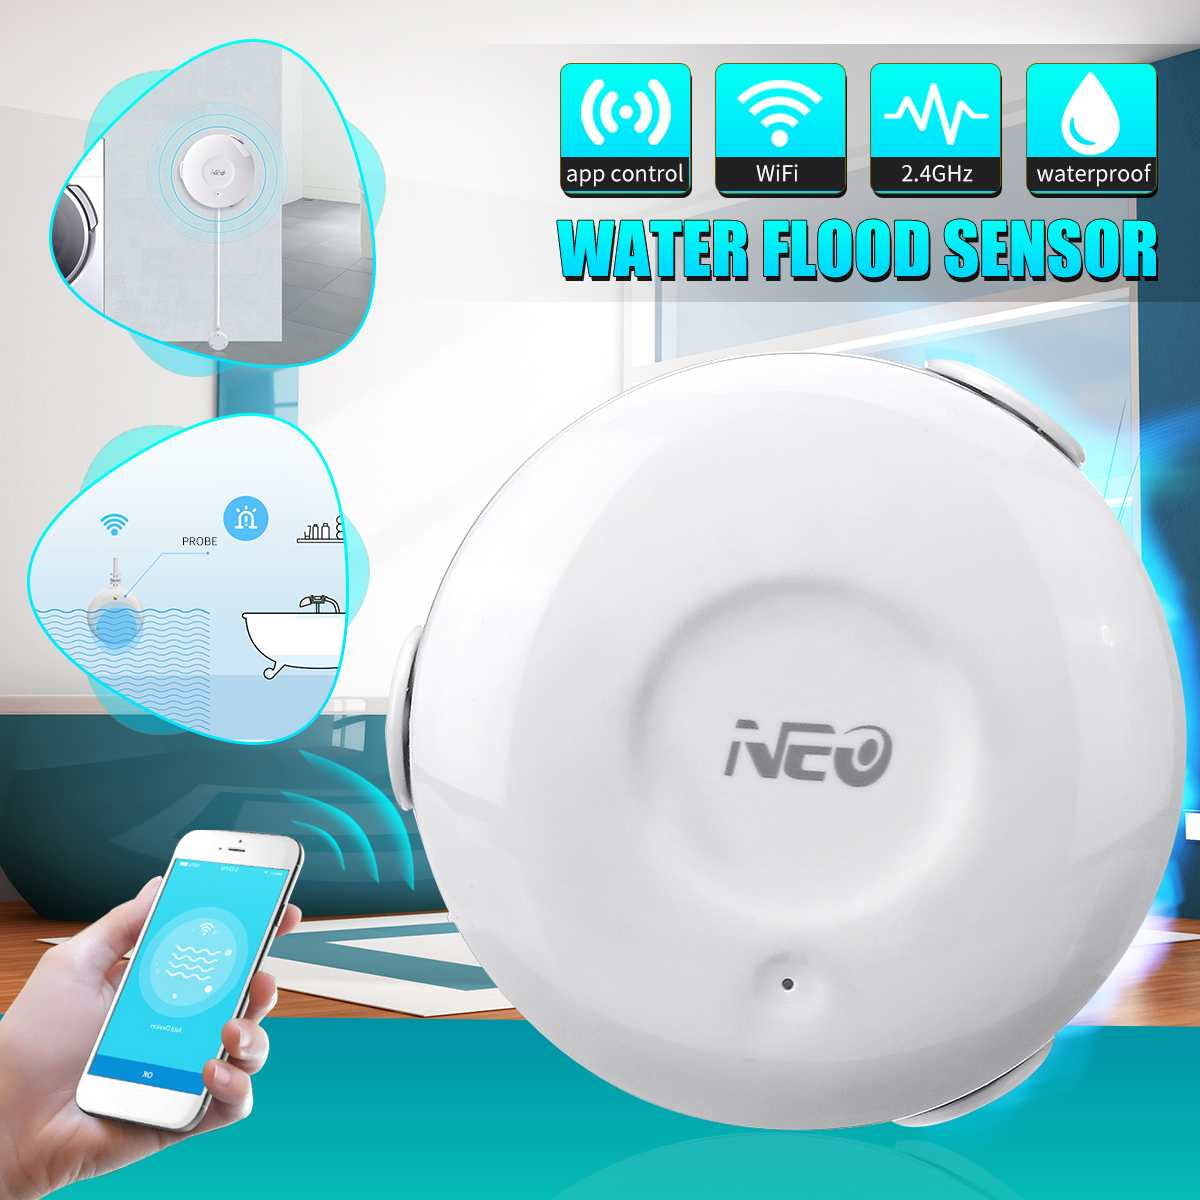 NEO White Smart WiFi Flood Sensor Alarm Water Leakage 2.4Ghz Indoor Overflow Detector Wireless Sensor APP Control Waterproof